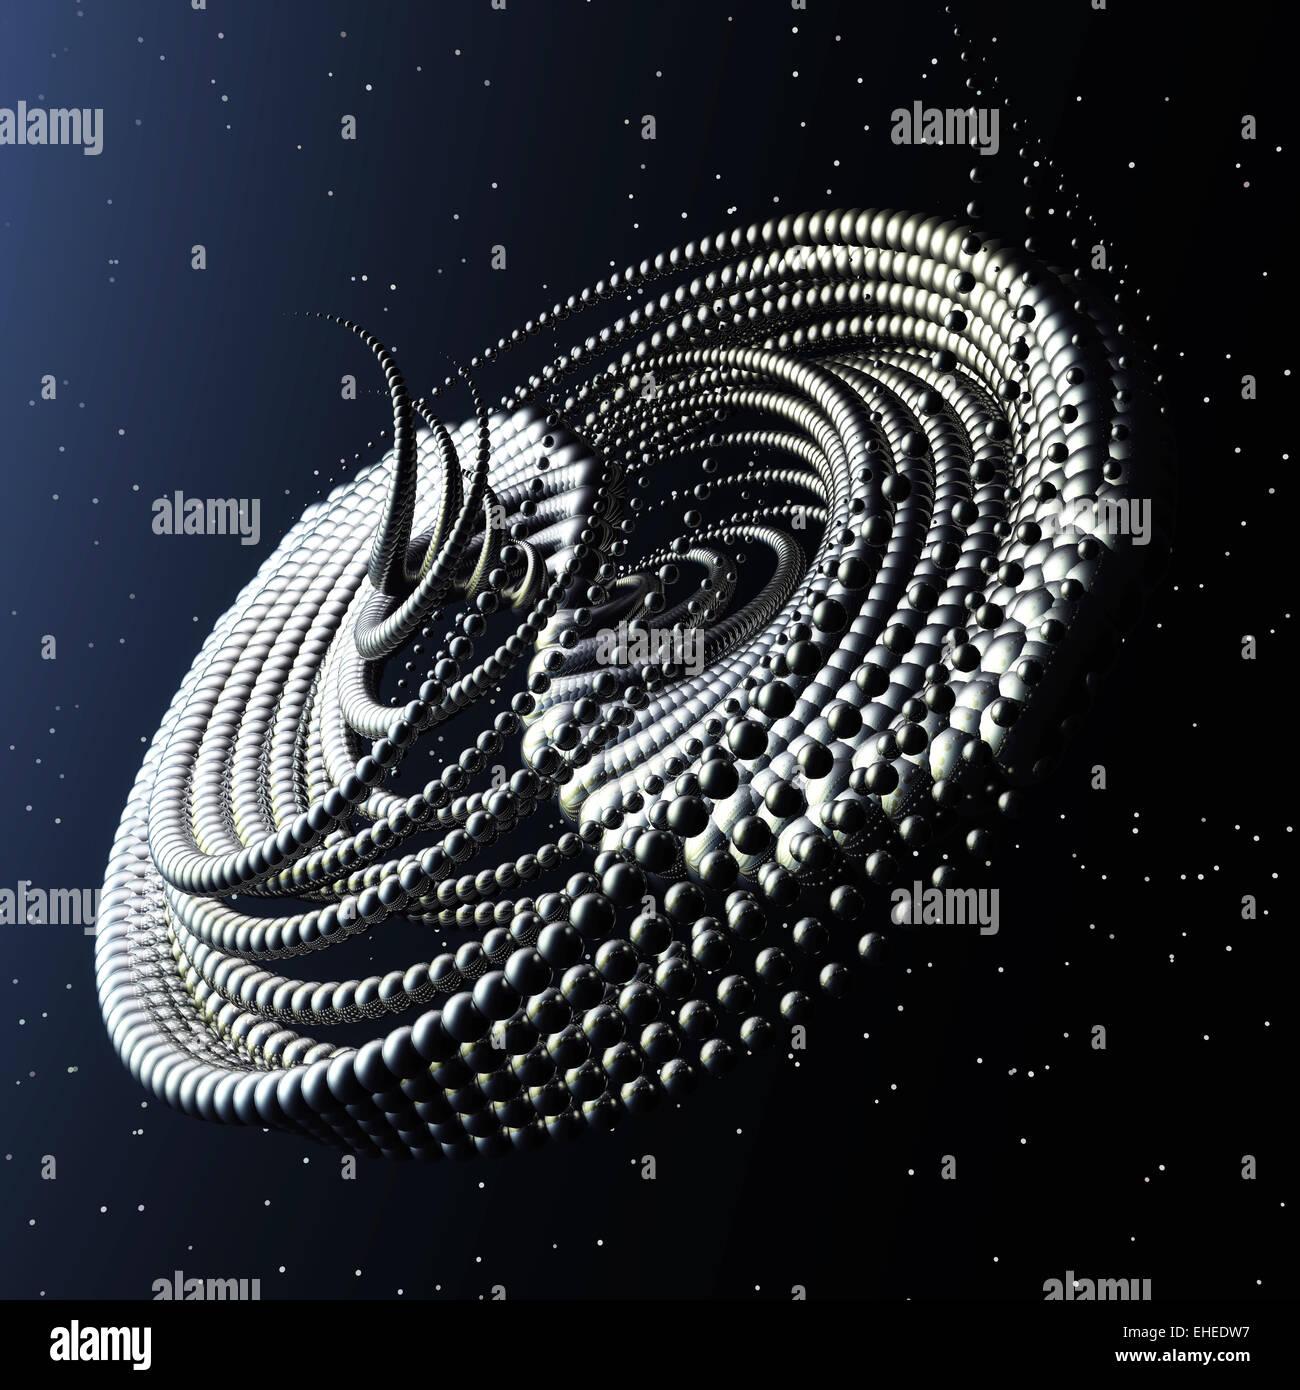 Dreidimensionale Fraktale Struktur Stockbild